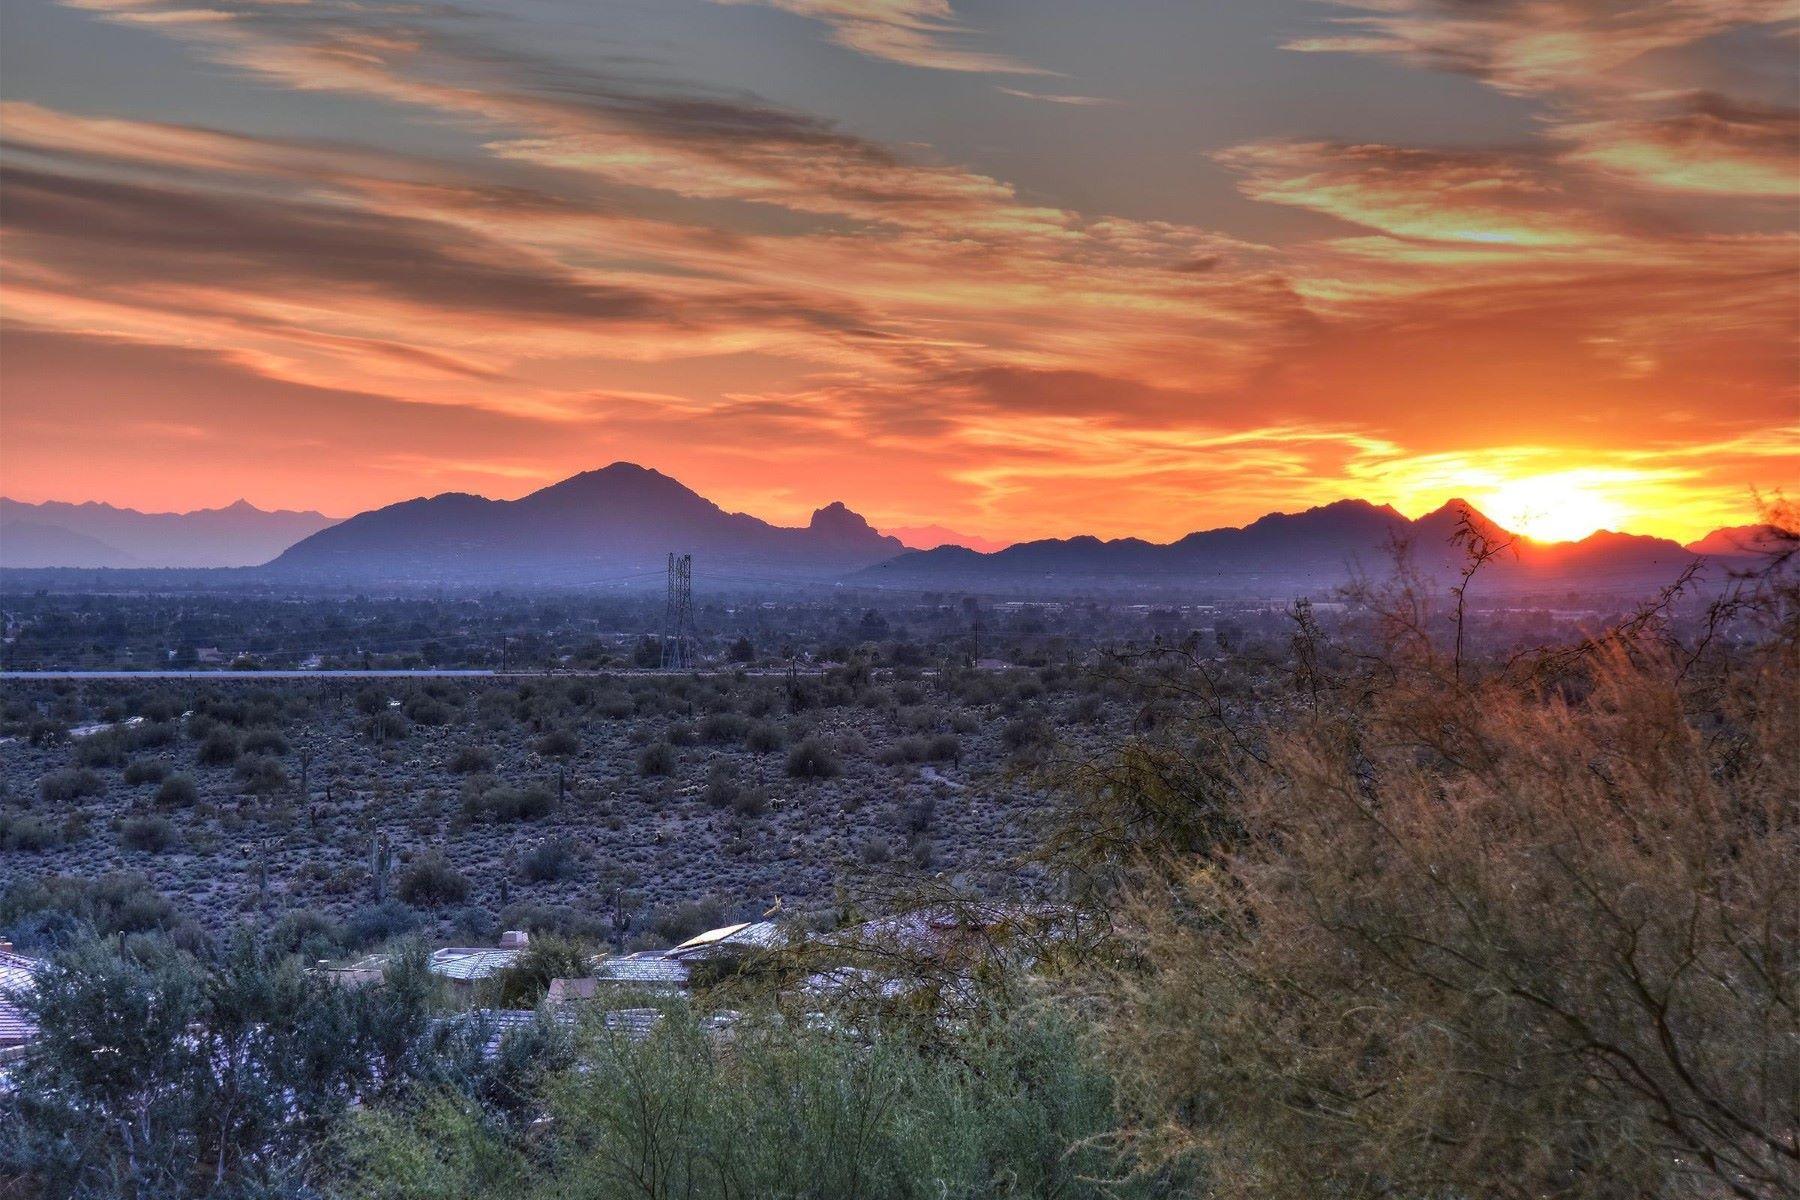 Premium large hillside build lot in Ancala 11412 E Dreyfus Ave #10 Scottsdale, Arizona 85259 United States